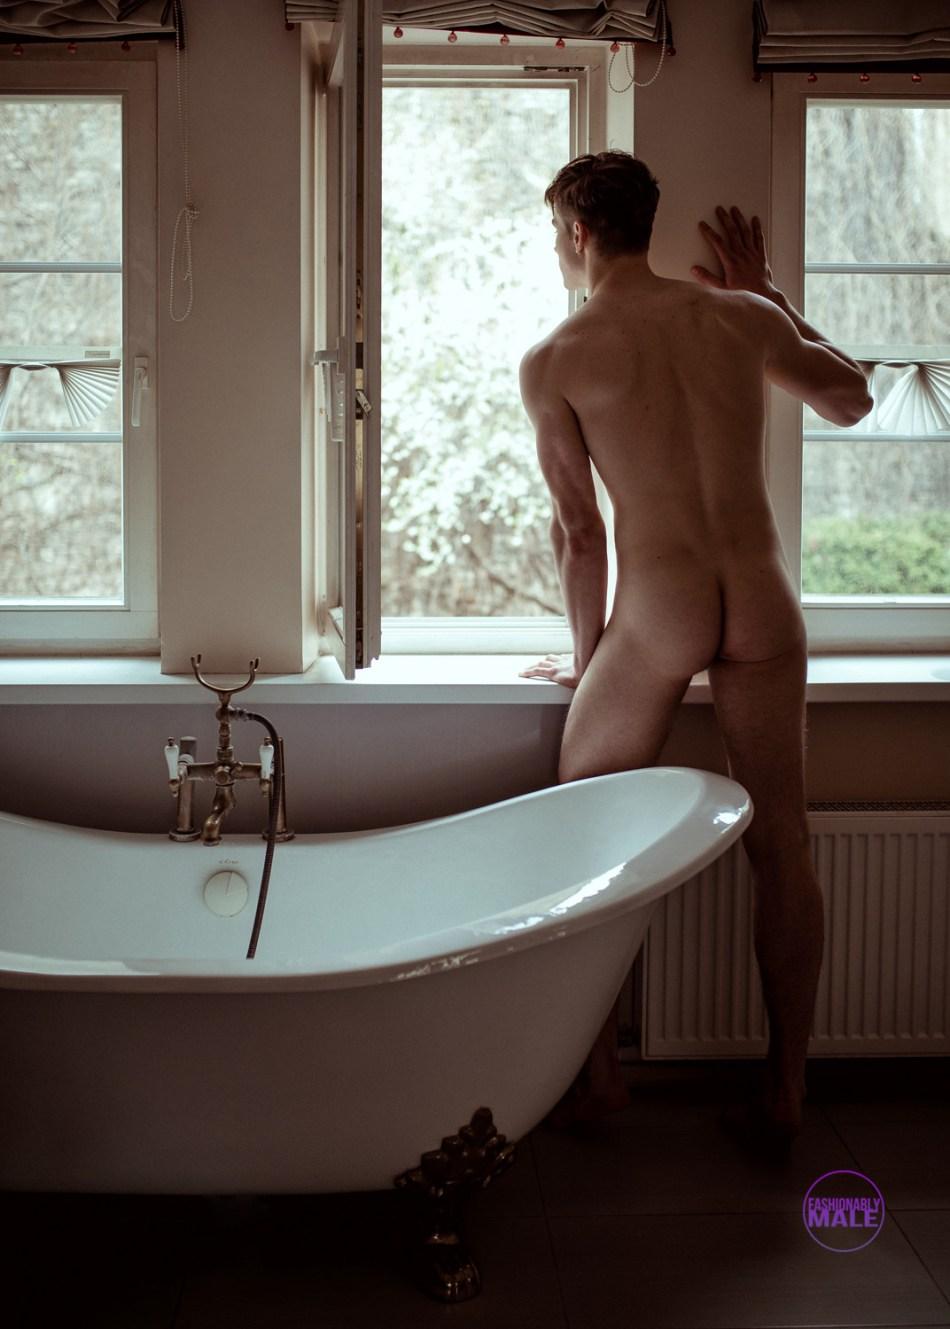 Photographer Dmitry Zemenkov Shares Intimate Portrait with Edvinas Pètra